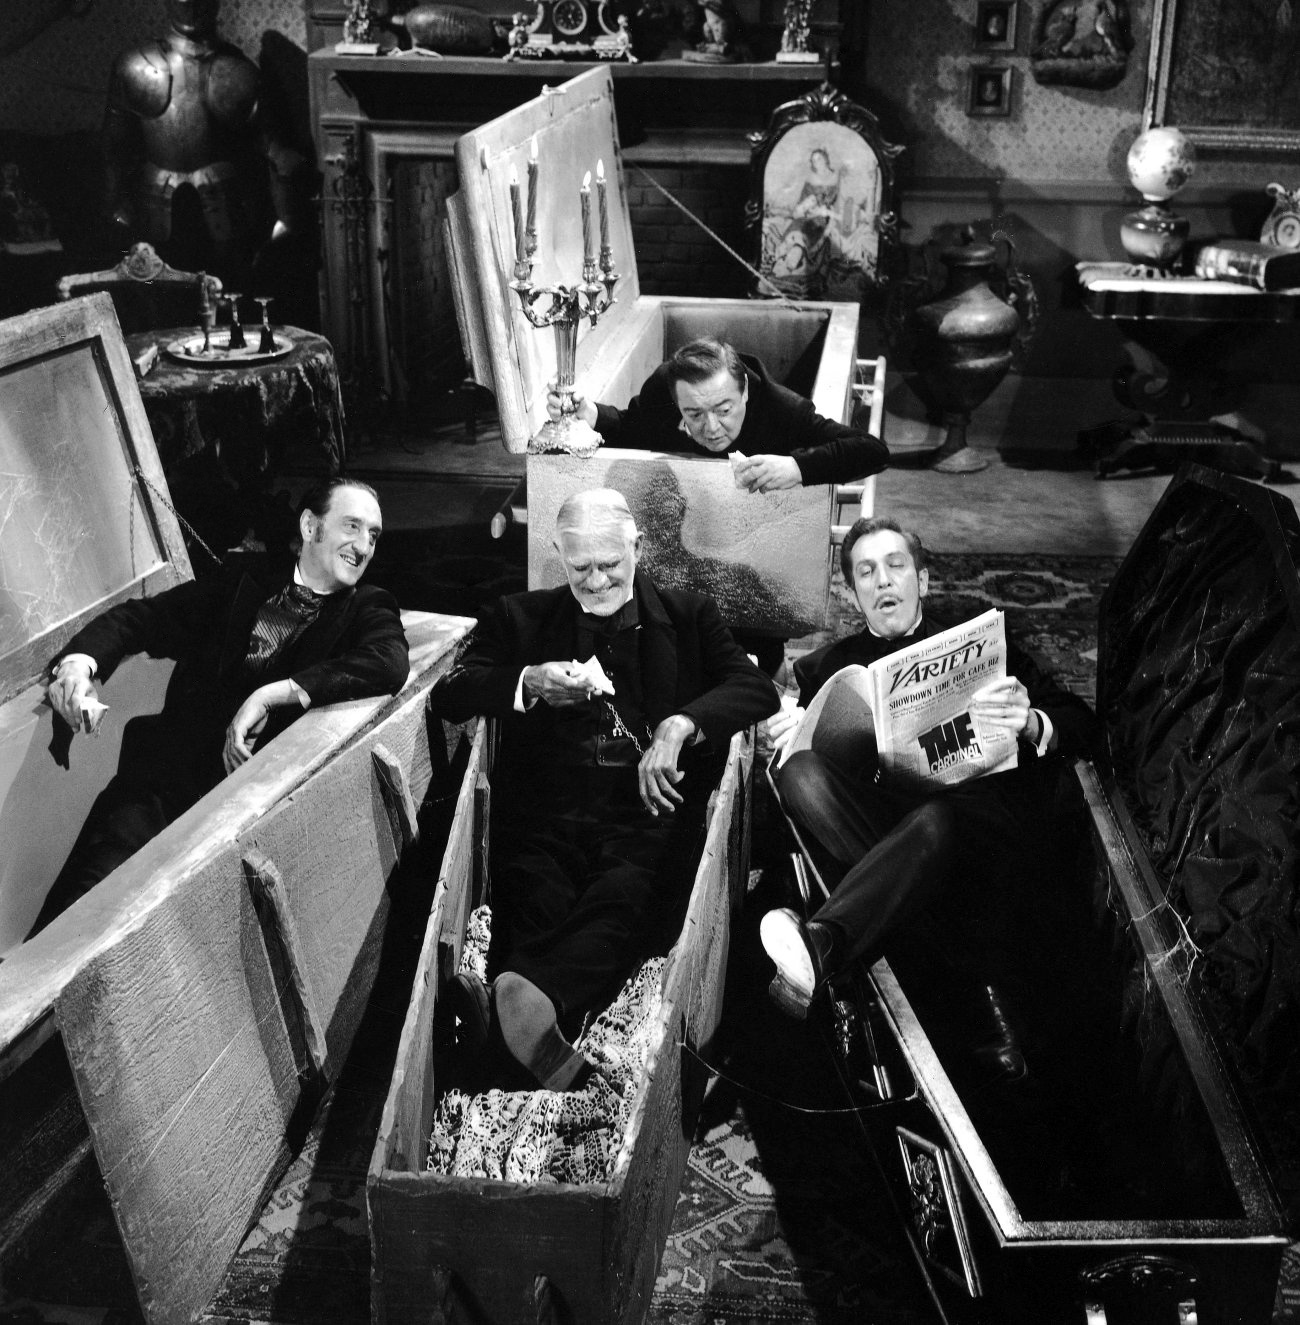 Basil Rathbone, Boris Karloff, Peter Lorre, Vincent Price